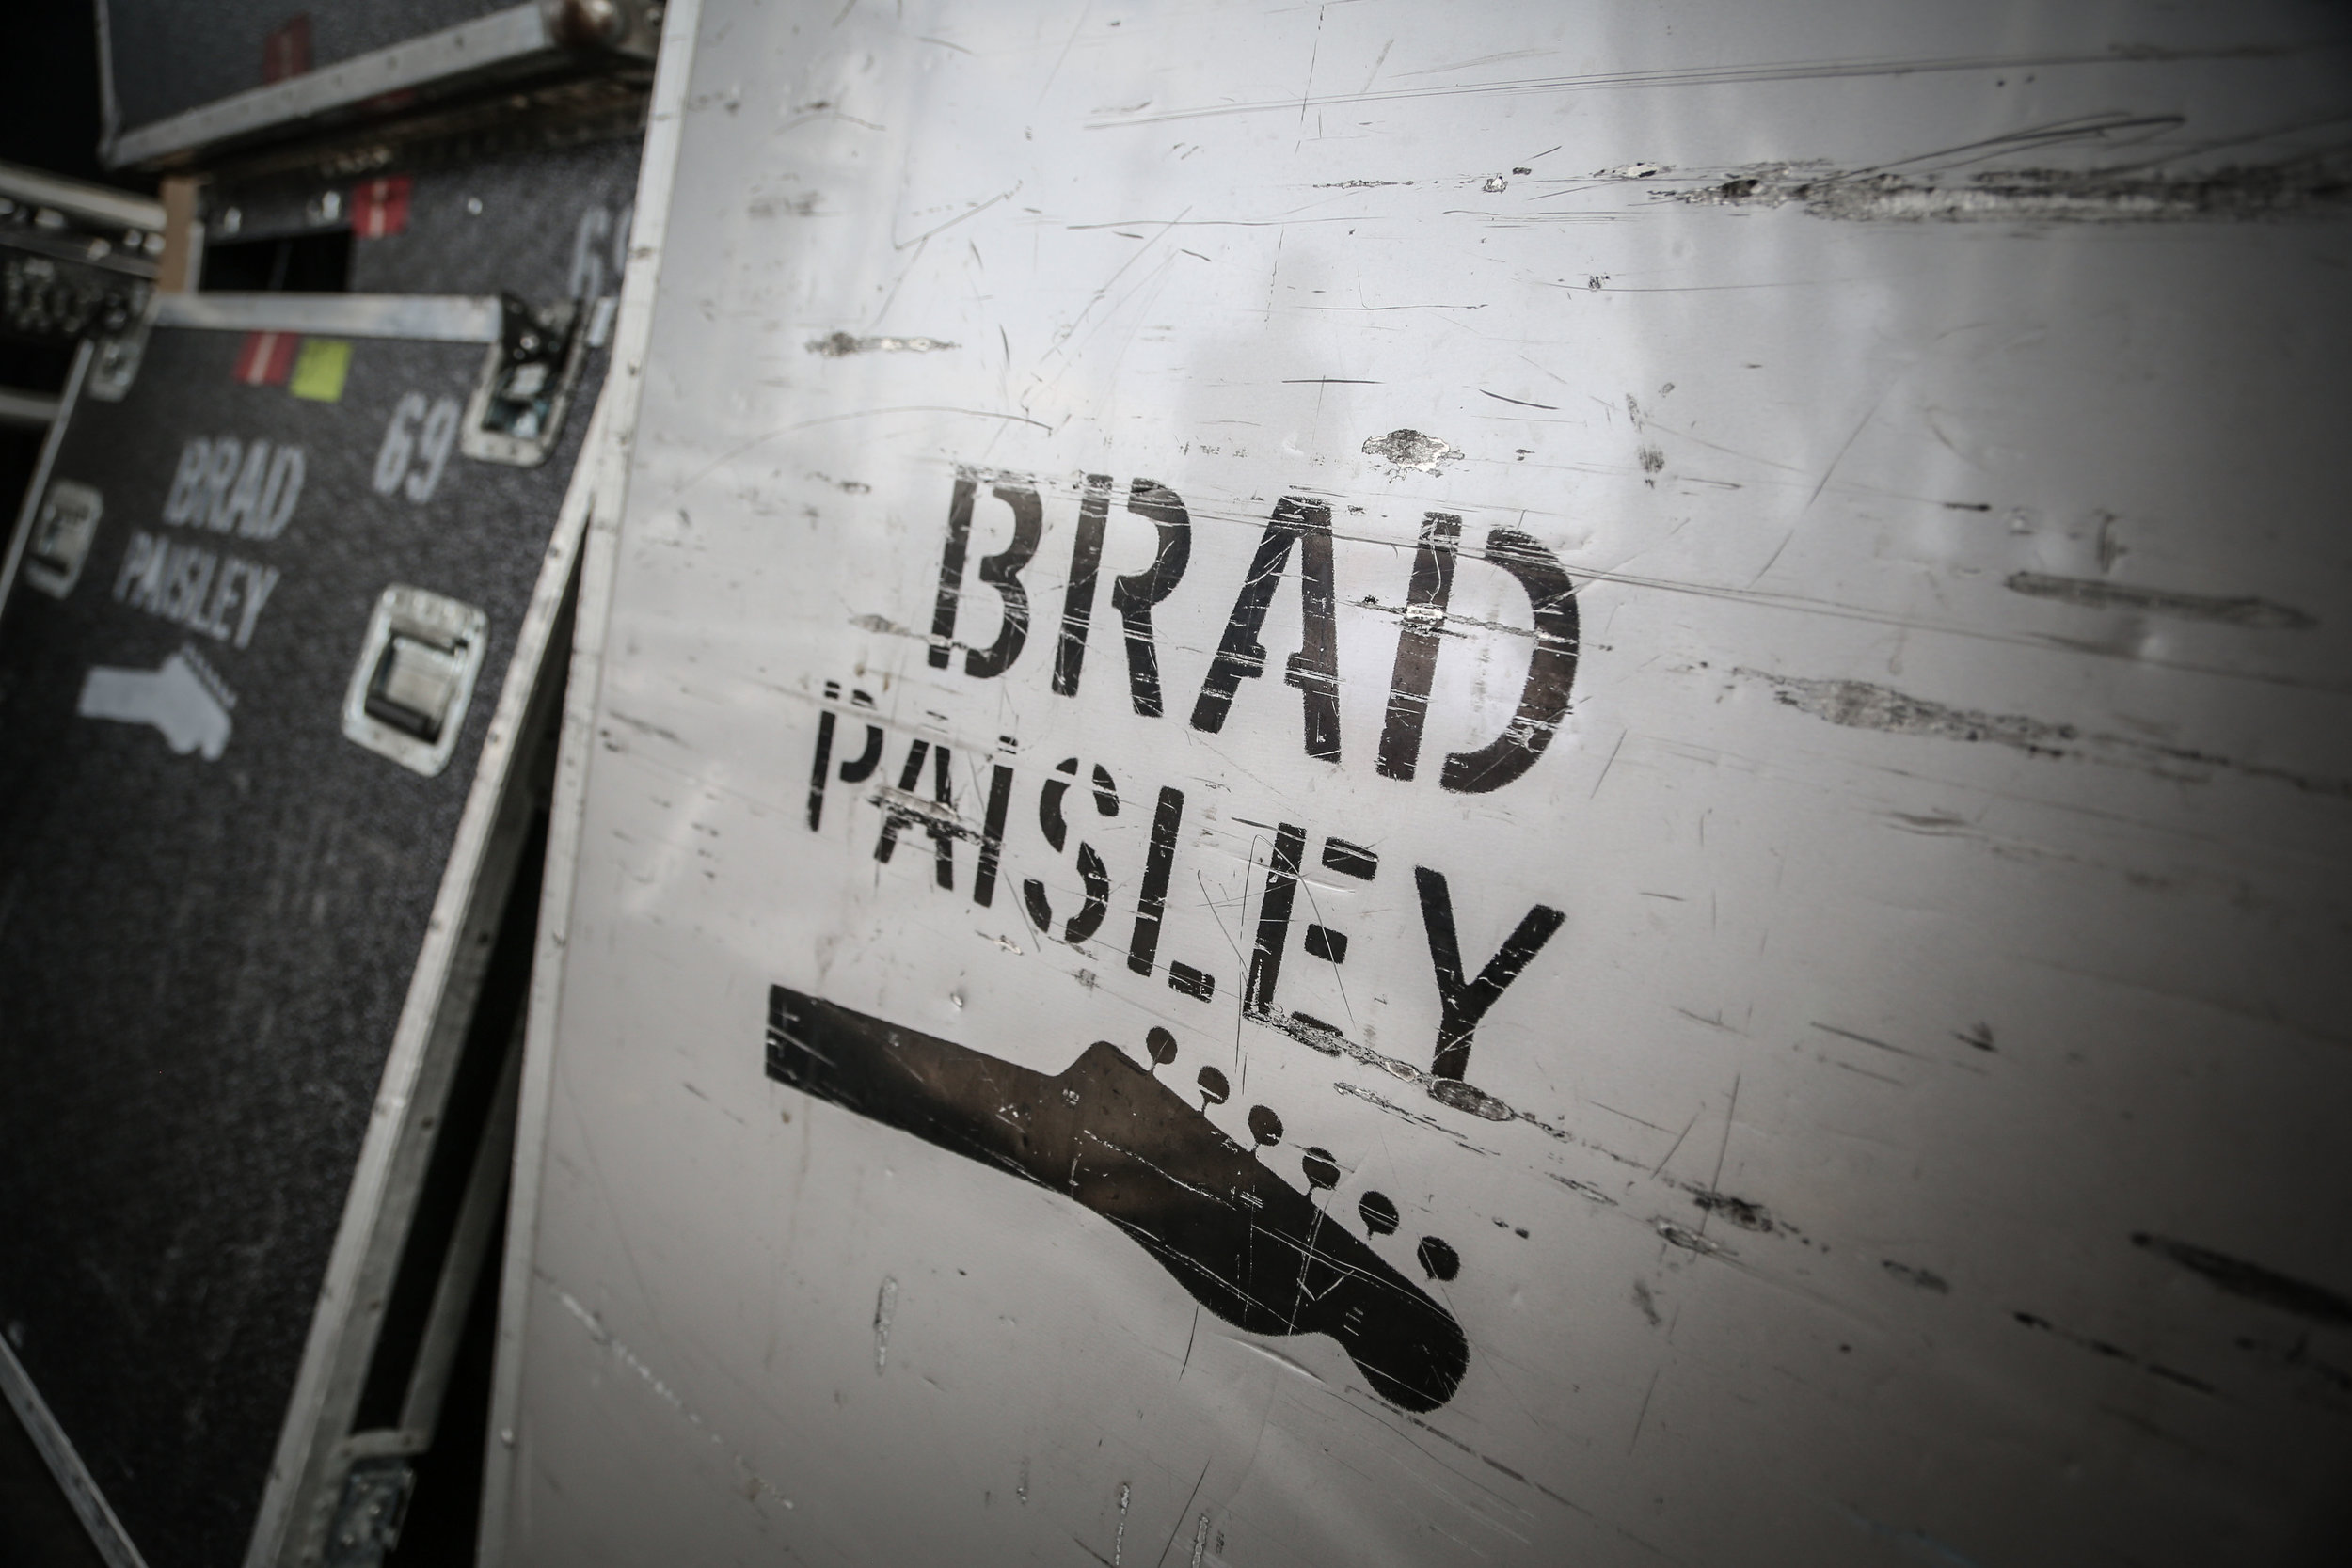 Landmarks Live_Brad Paisley_C7848 by Chris Bradshaw.jpg